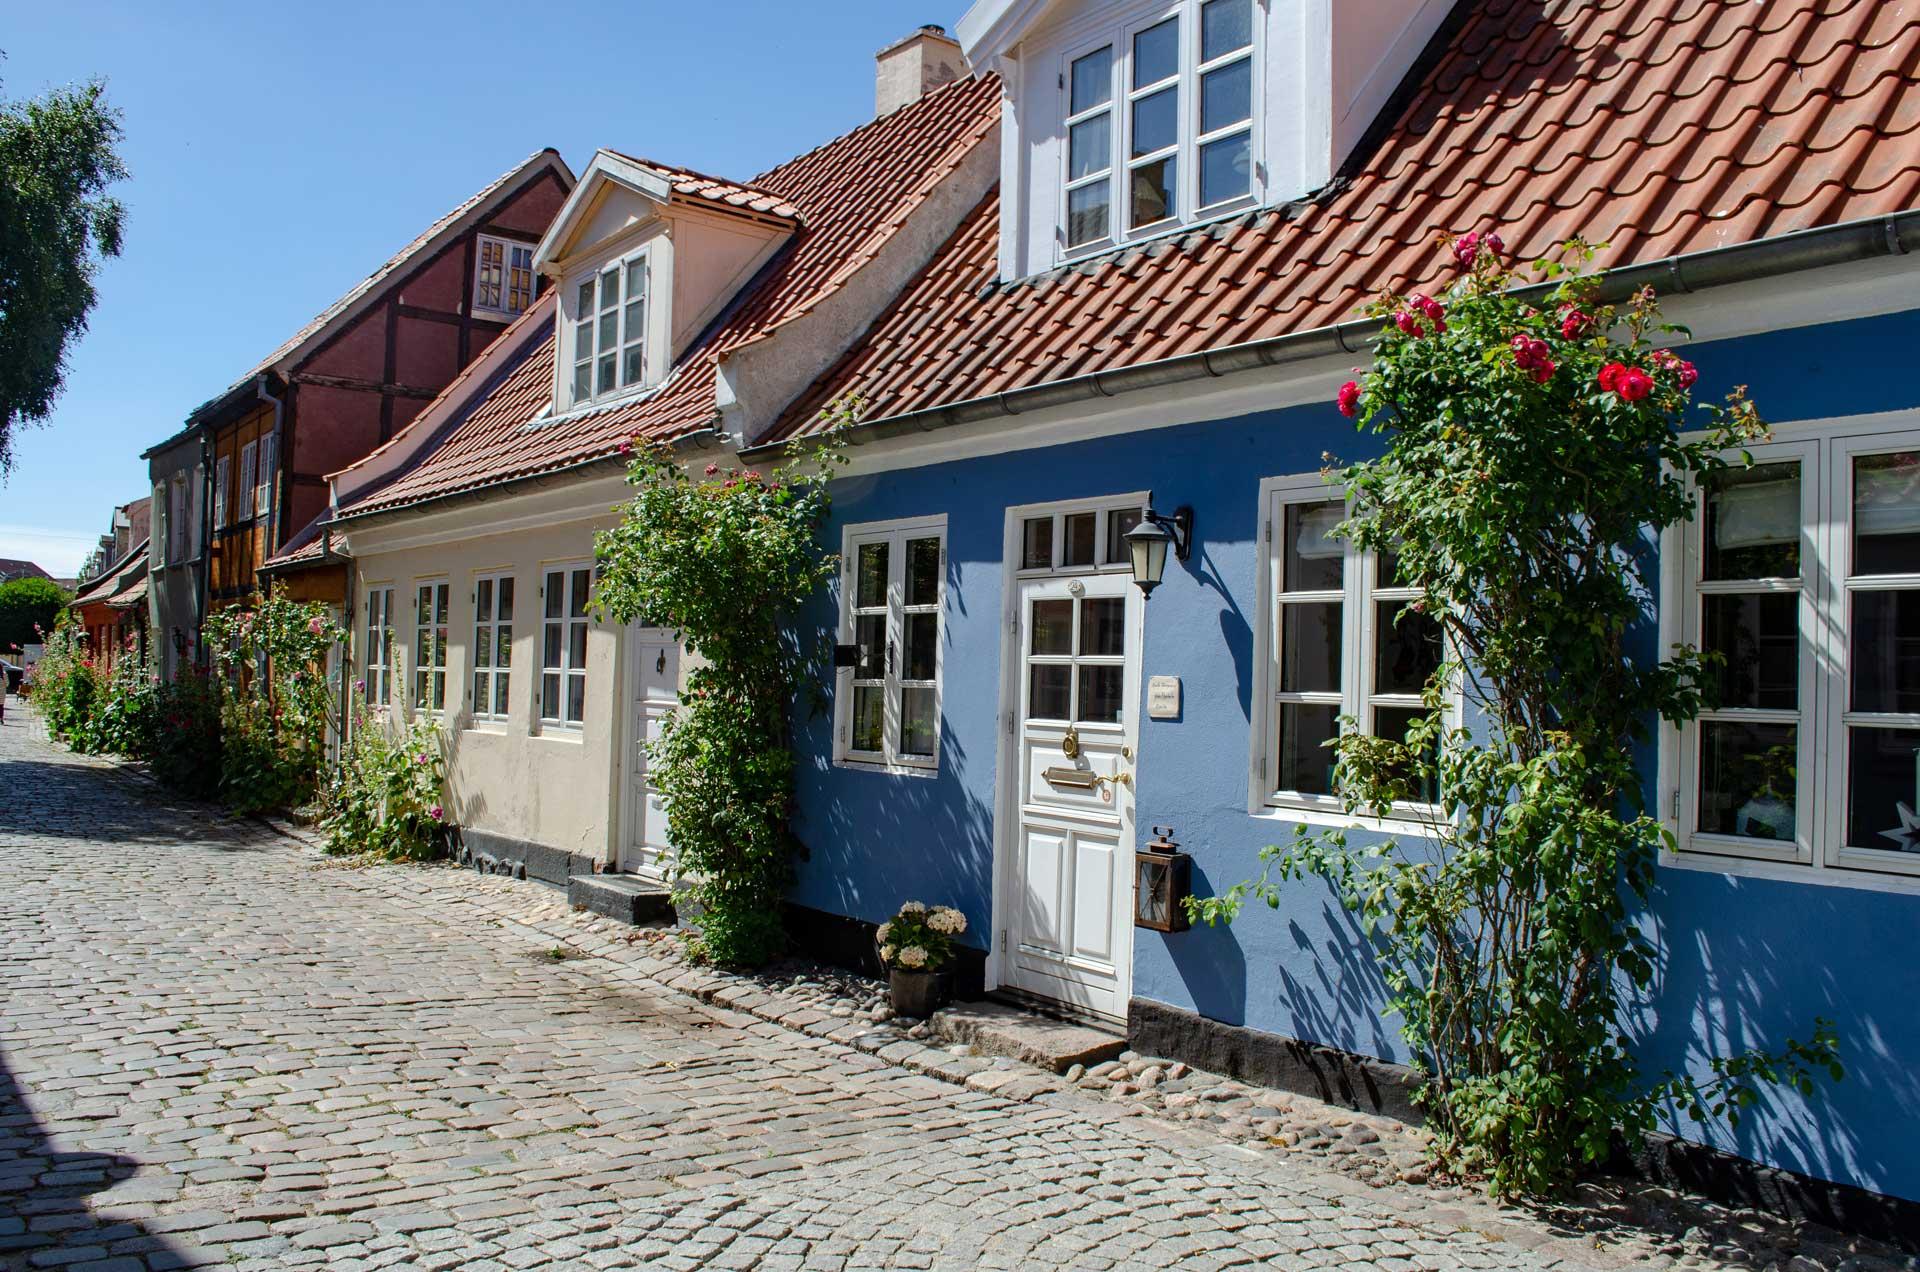 Aarhus Møllestien © Pfotentour